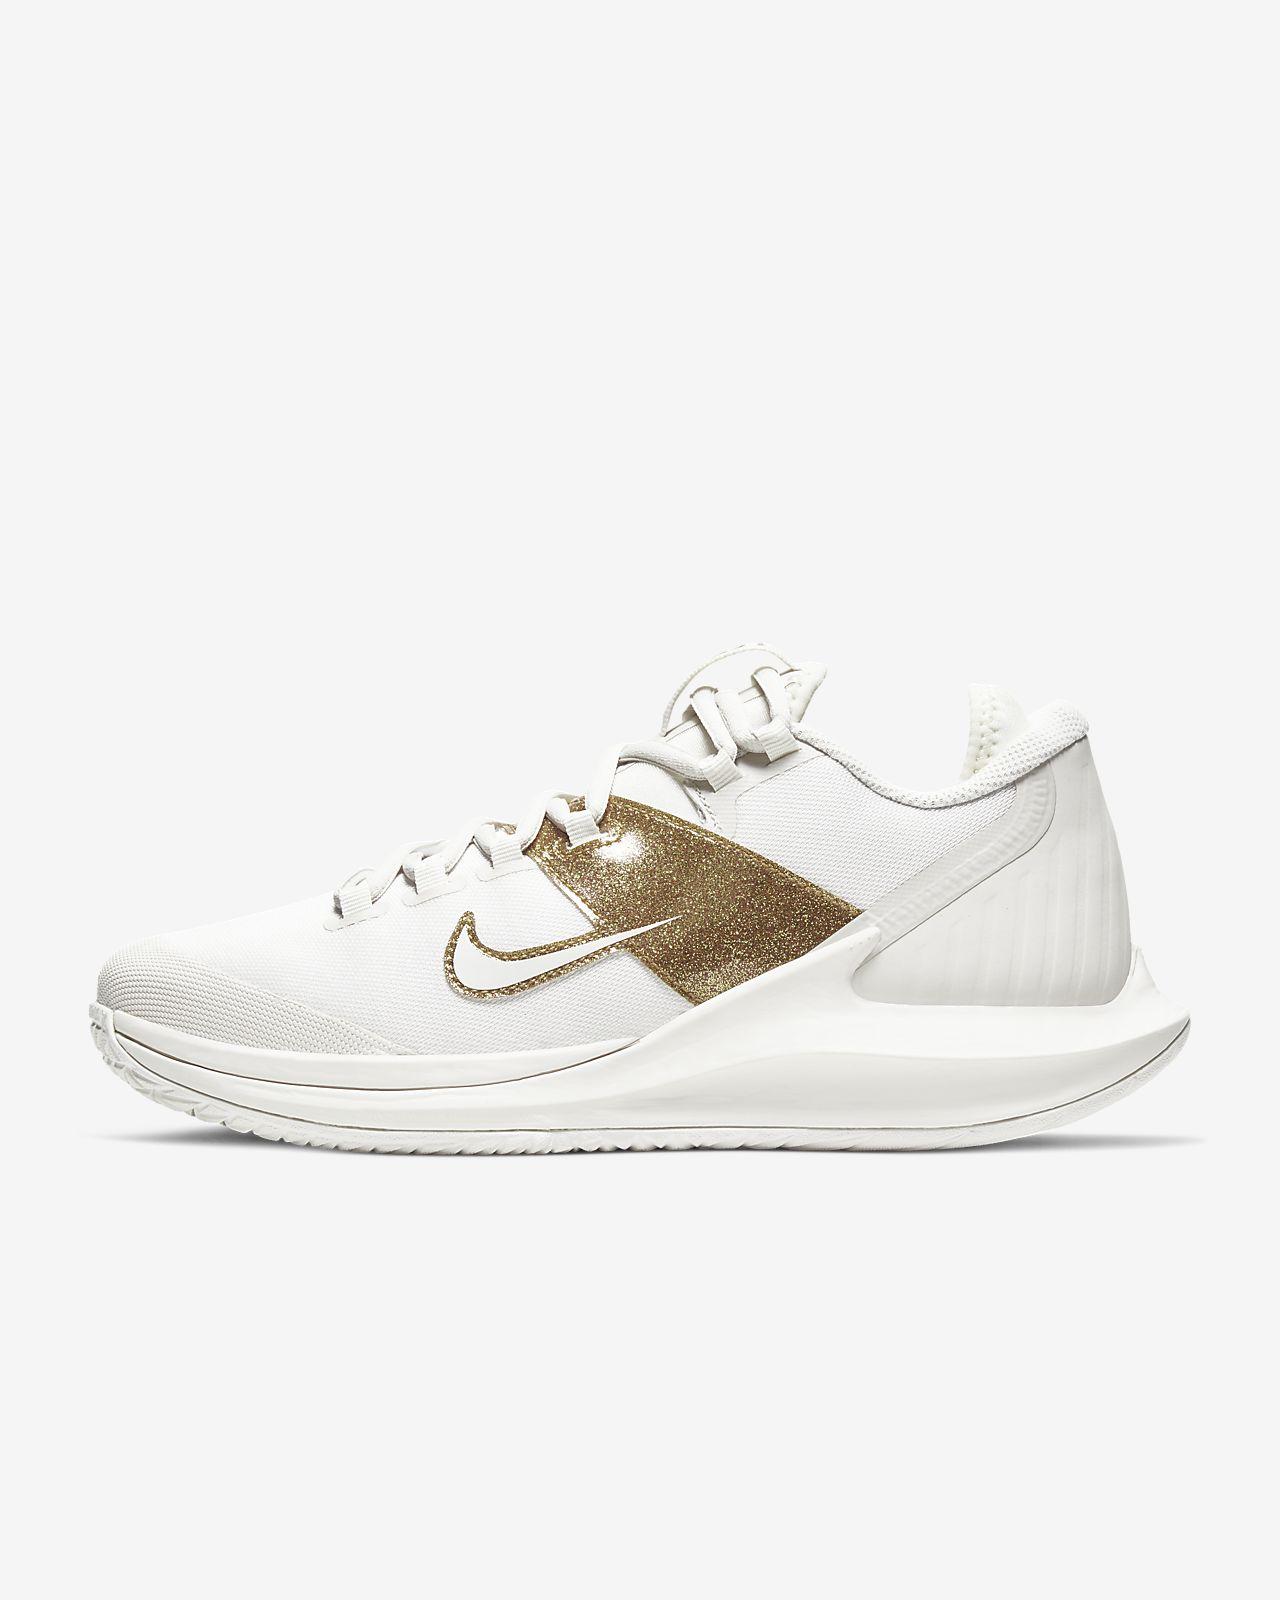 NikeCourt Air Zoom Zero tennissko til dame